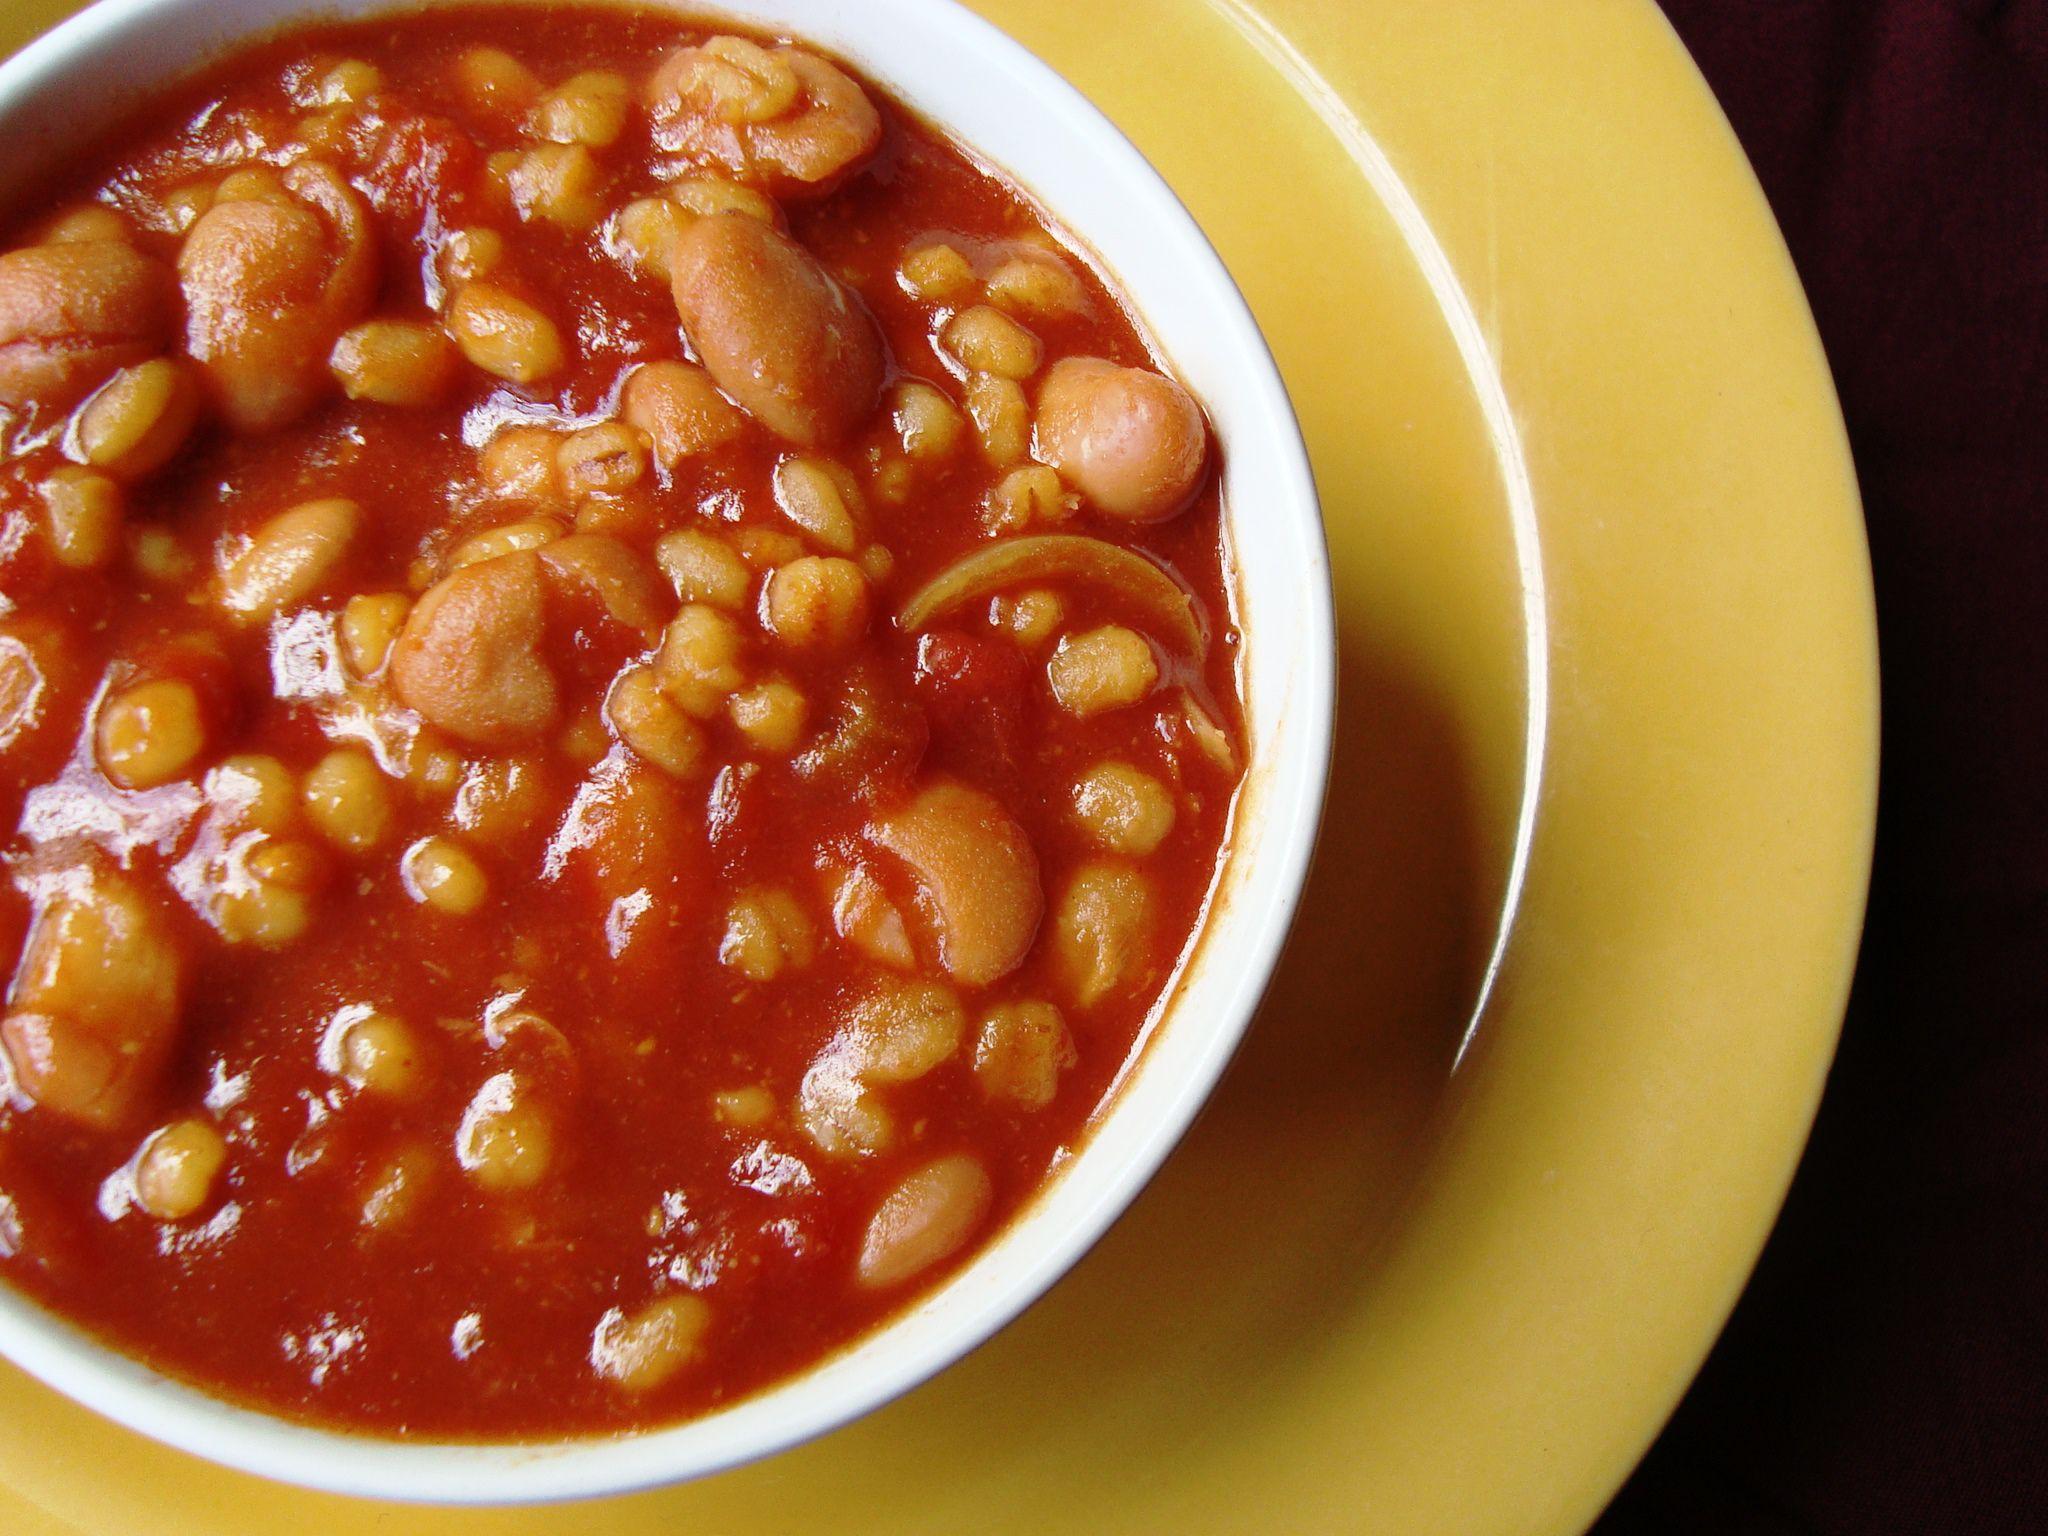 Jk Auto Repair >> Vegan Crock Pot Chili with Barley Recipe